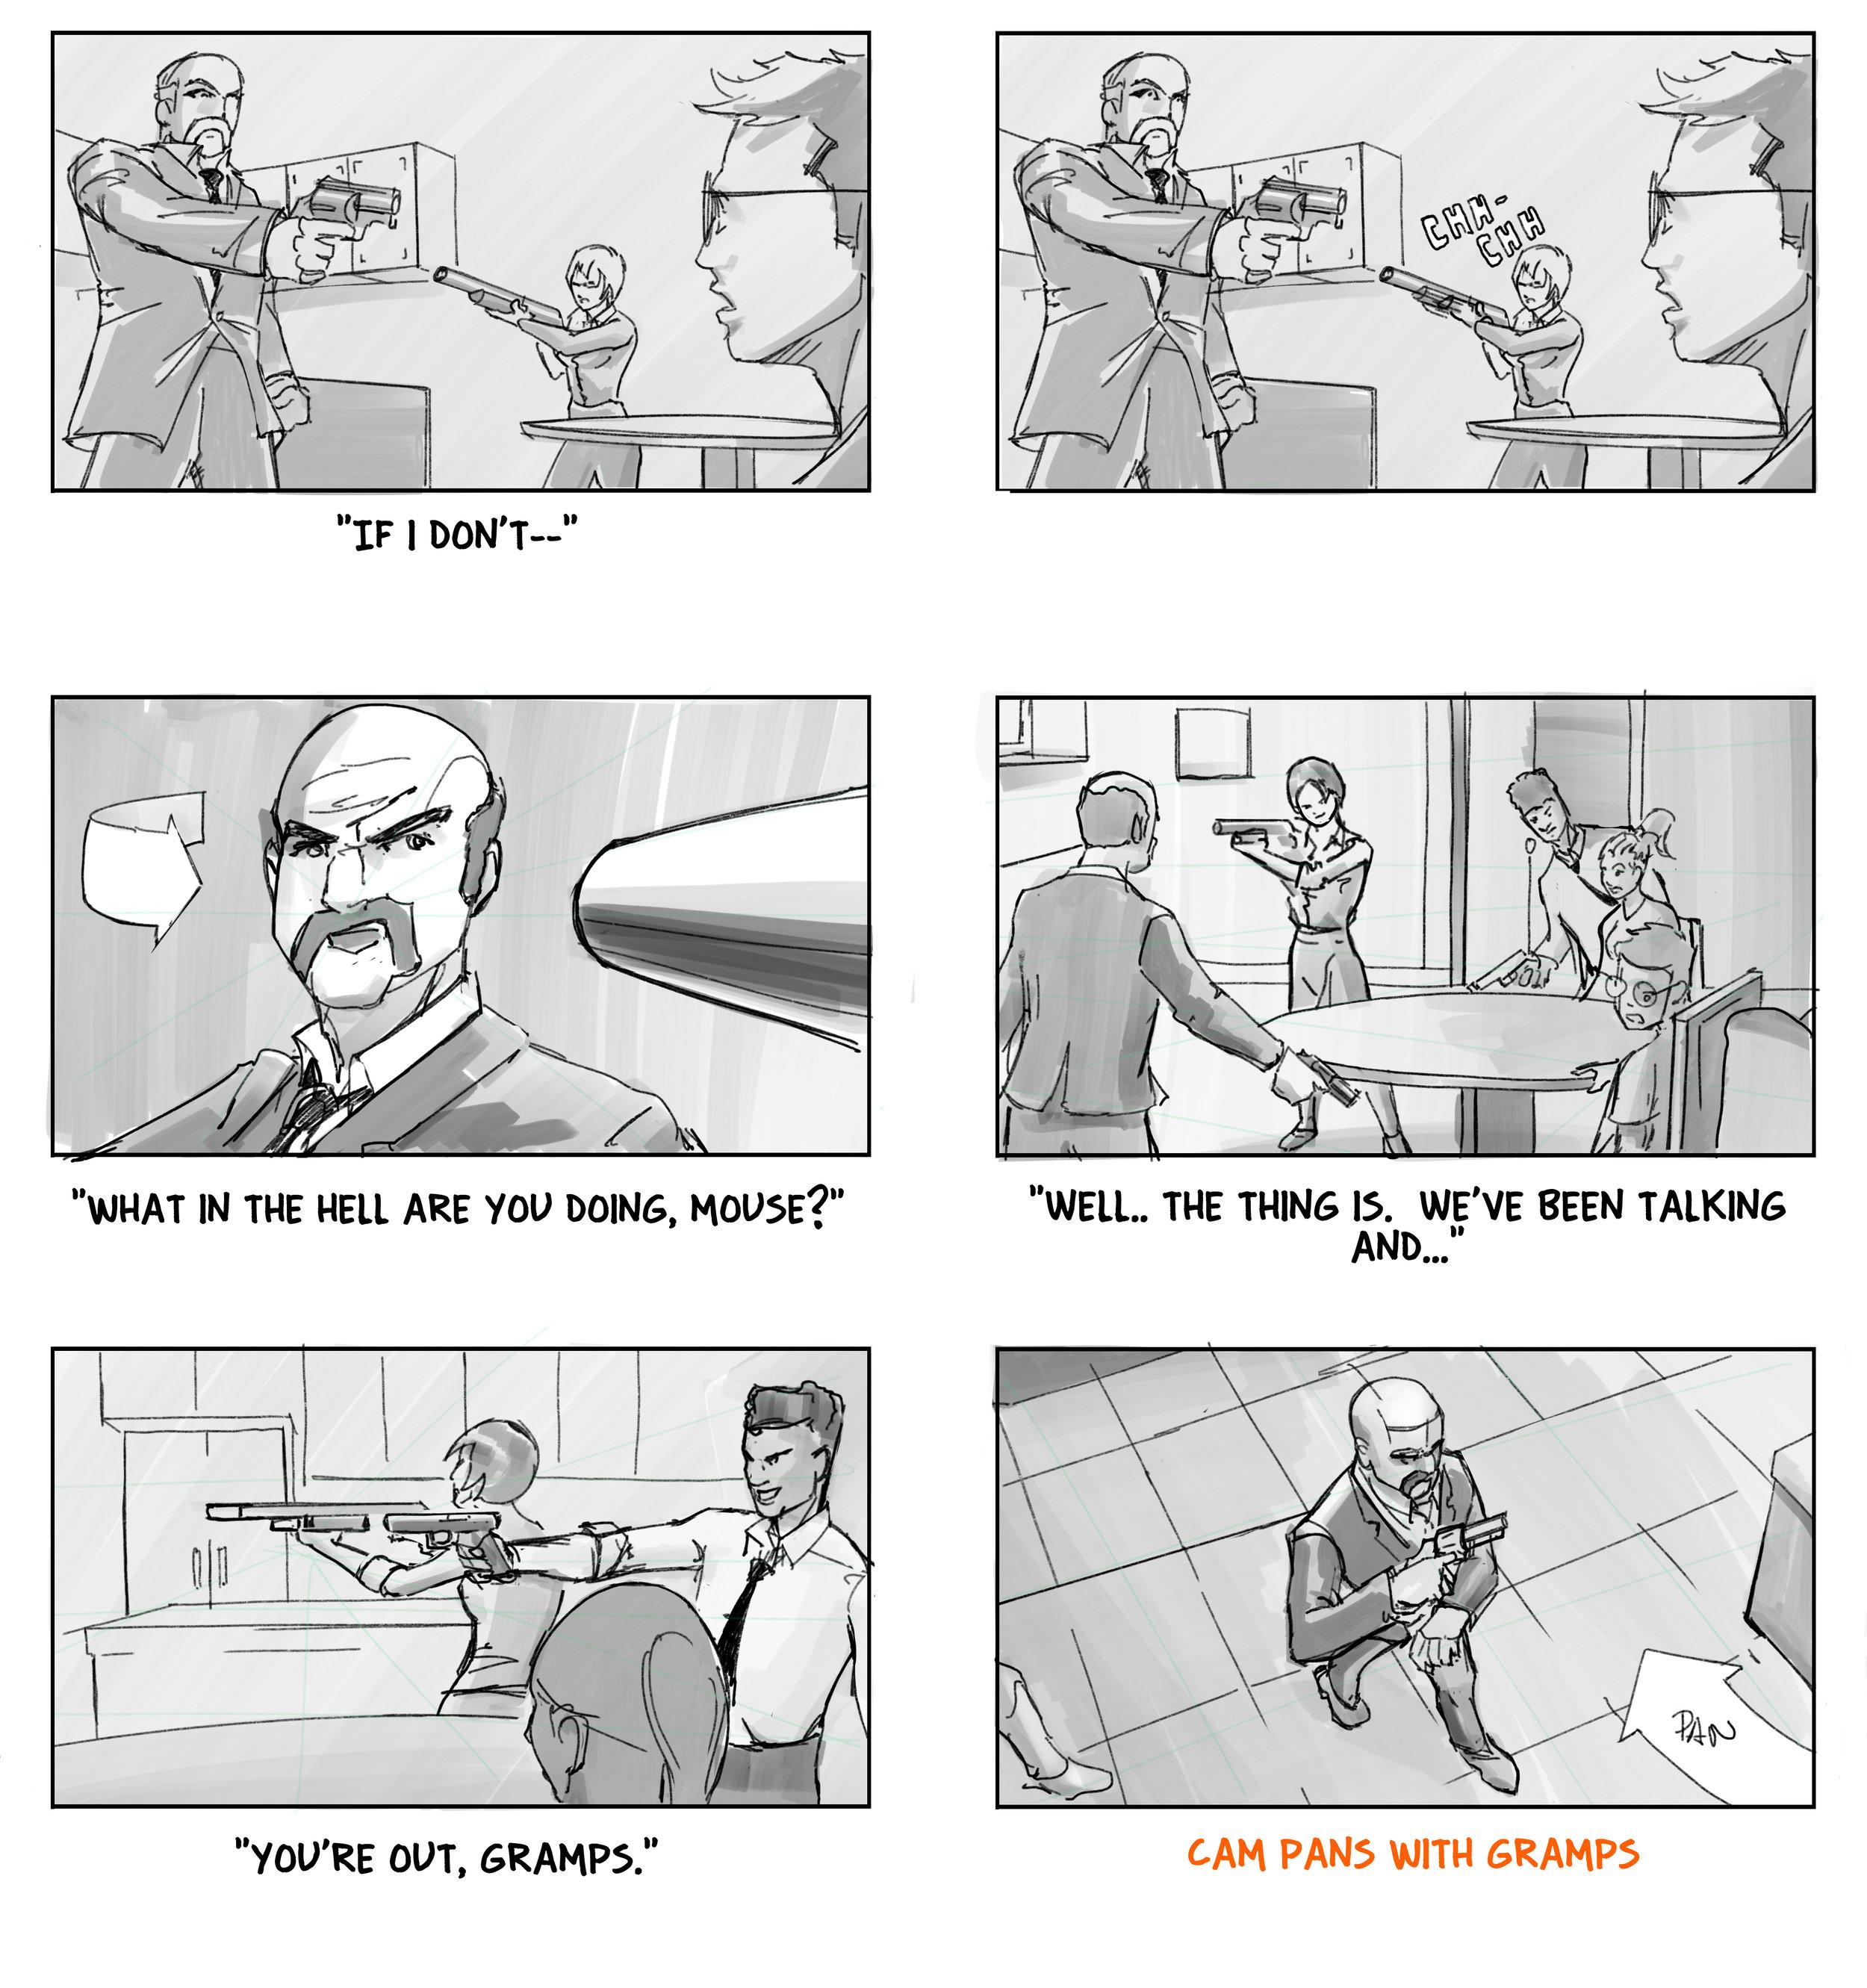 SAM_BS_Catapano_Storyboards_006.jpg